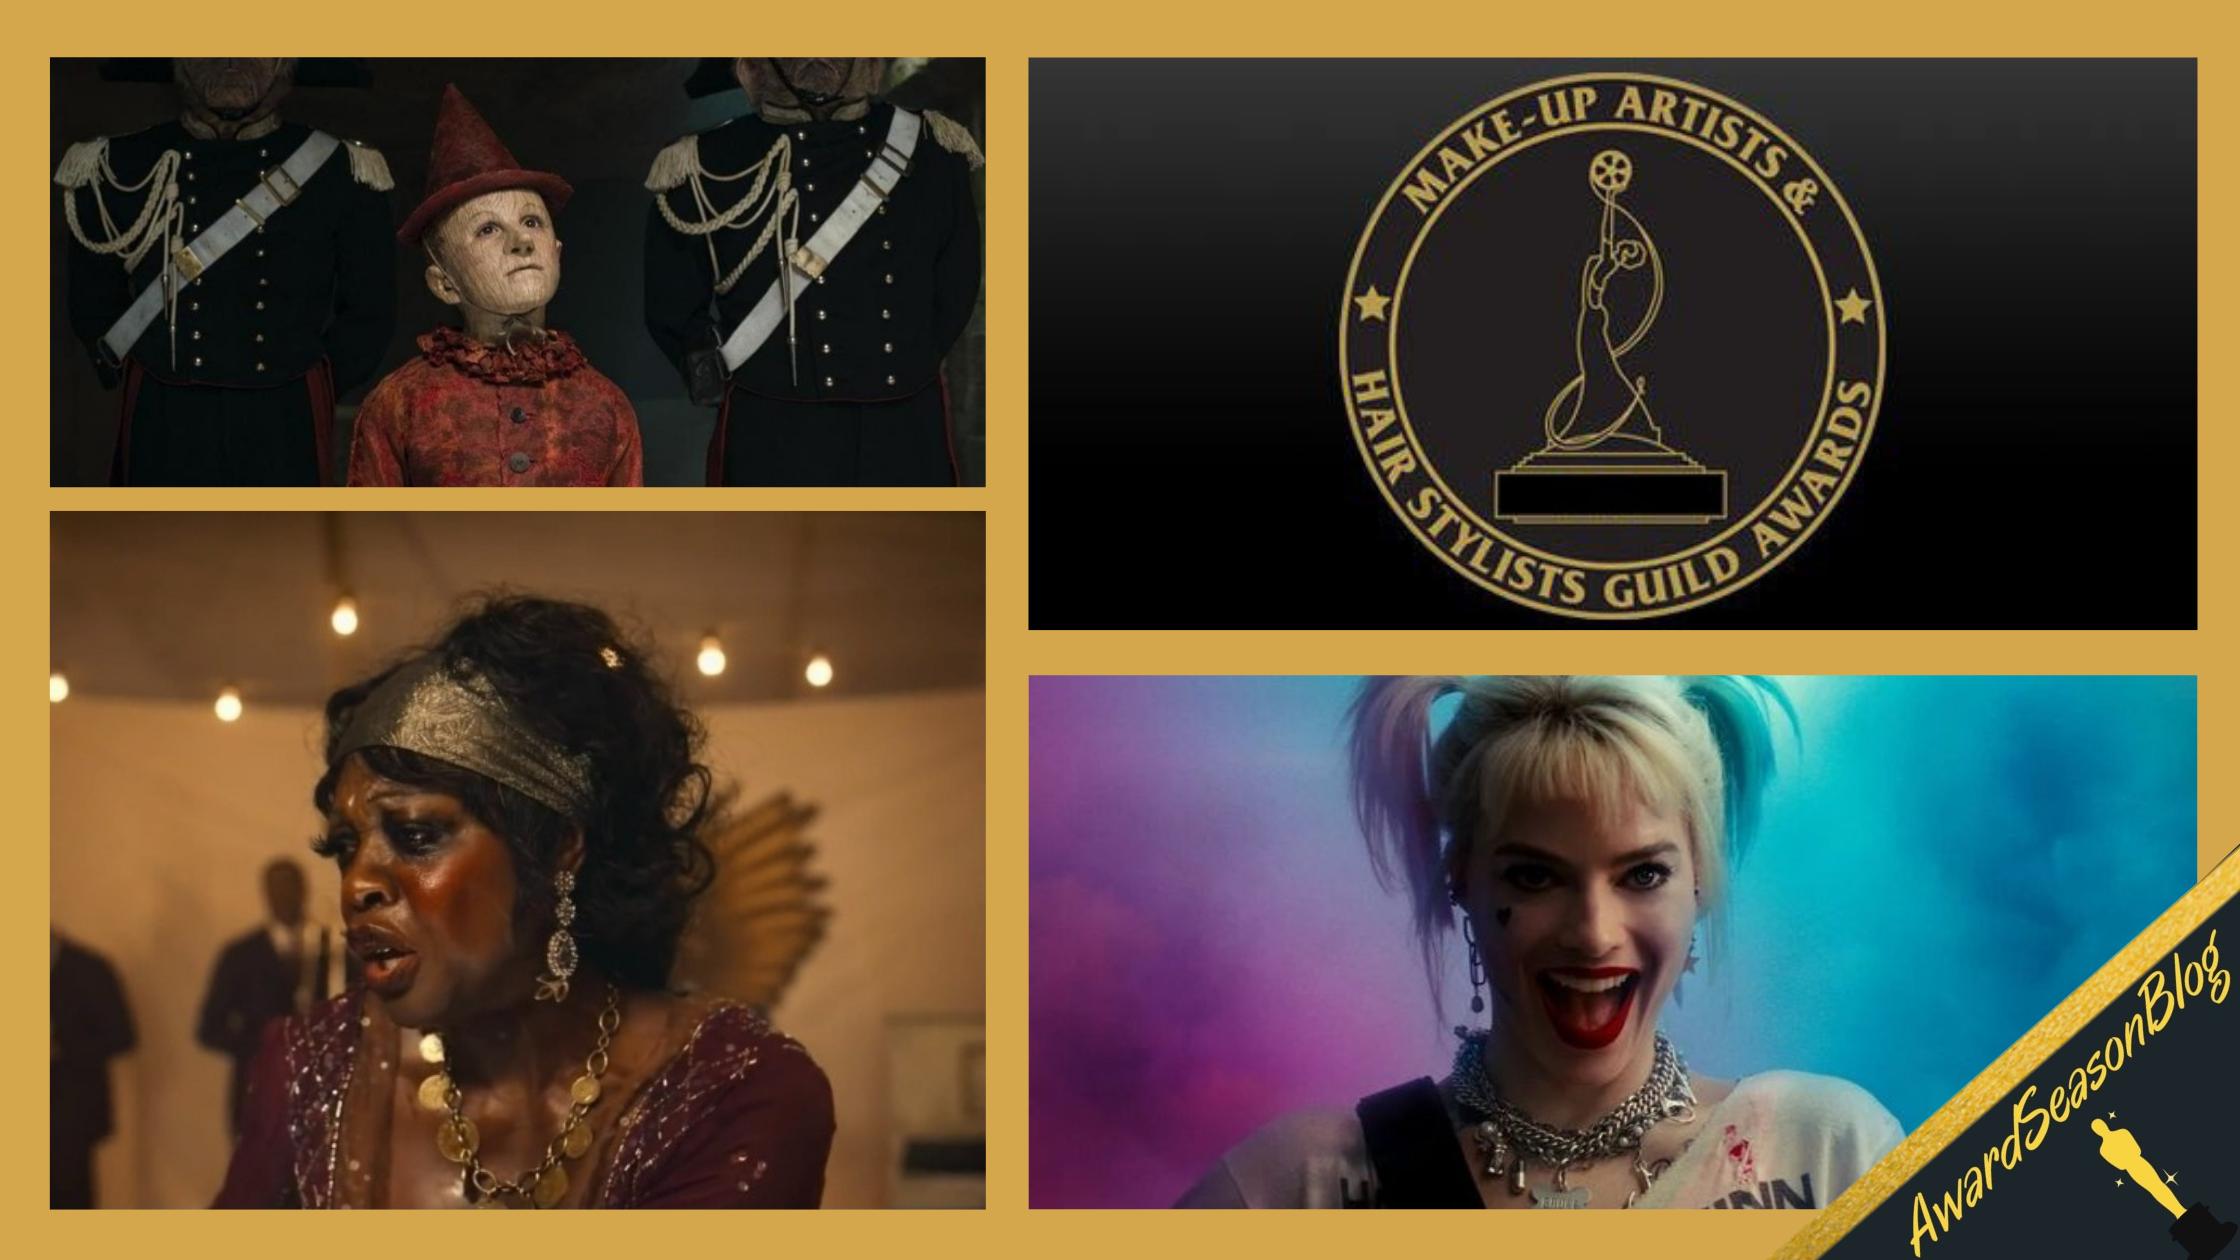 Makeup Artists and Hair Stylists Guild Awards 2021: vincono Pinocchio e Ma Rainey's Black Bottom